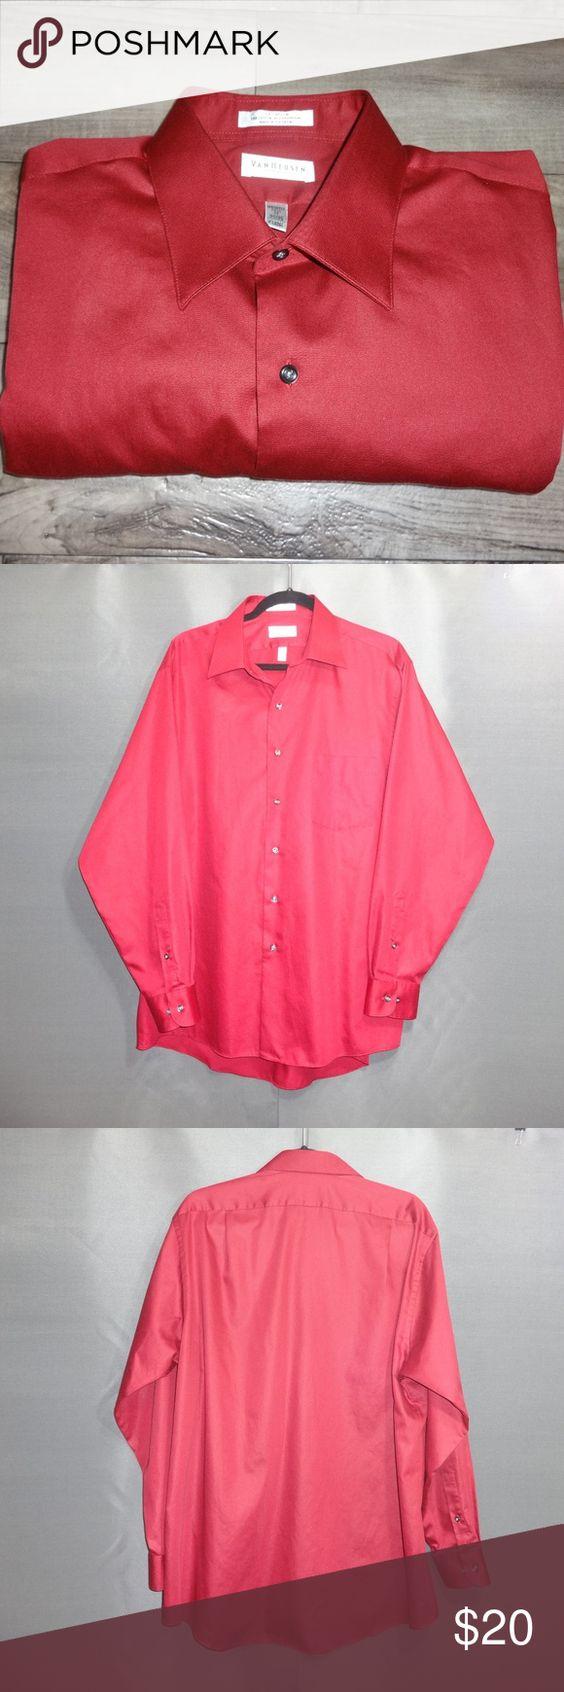 Van Heusen Men S Dress Shirt Burgundy Red Size 17 Van Heusen Men S Dress Shirt Wrinkle Free Lux Sateen Brand Van H Mens Shirt Dress Clothes Design Red Fashion